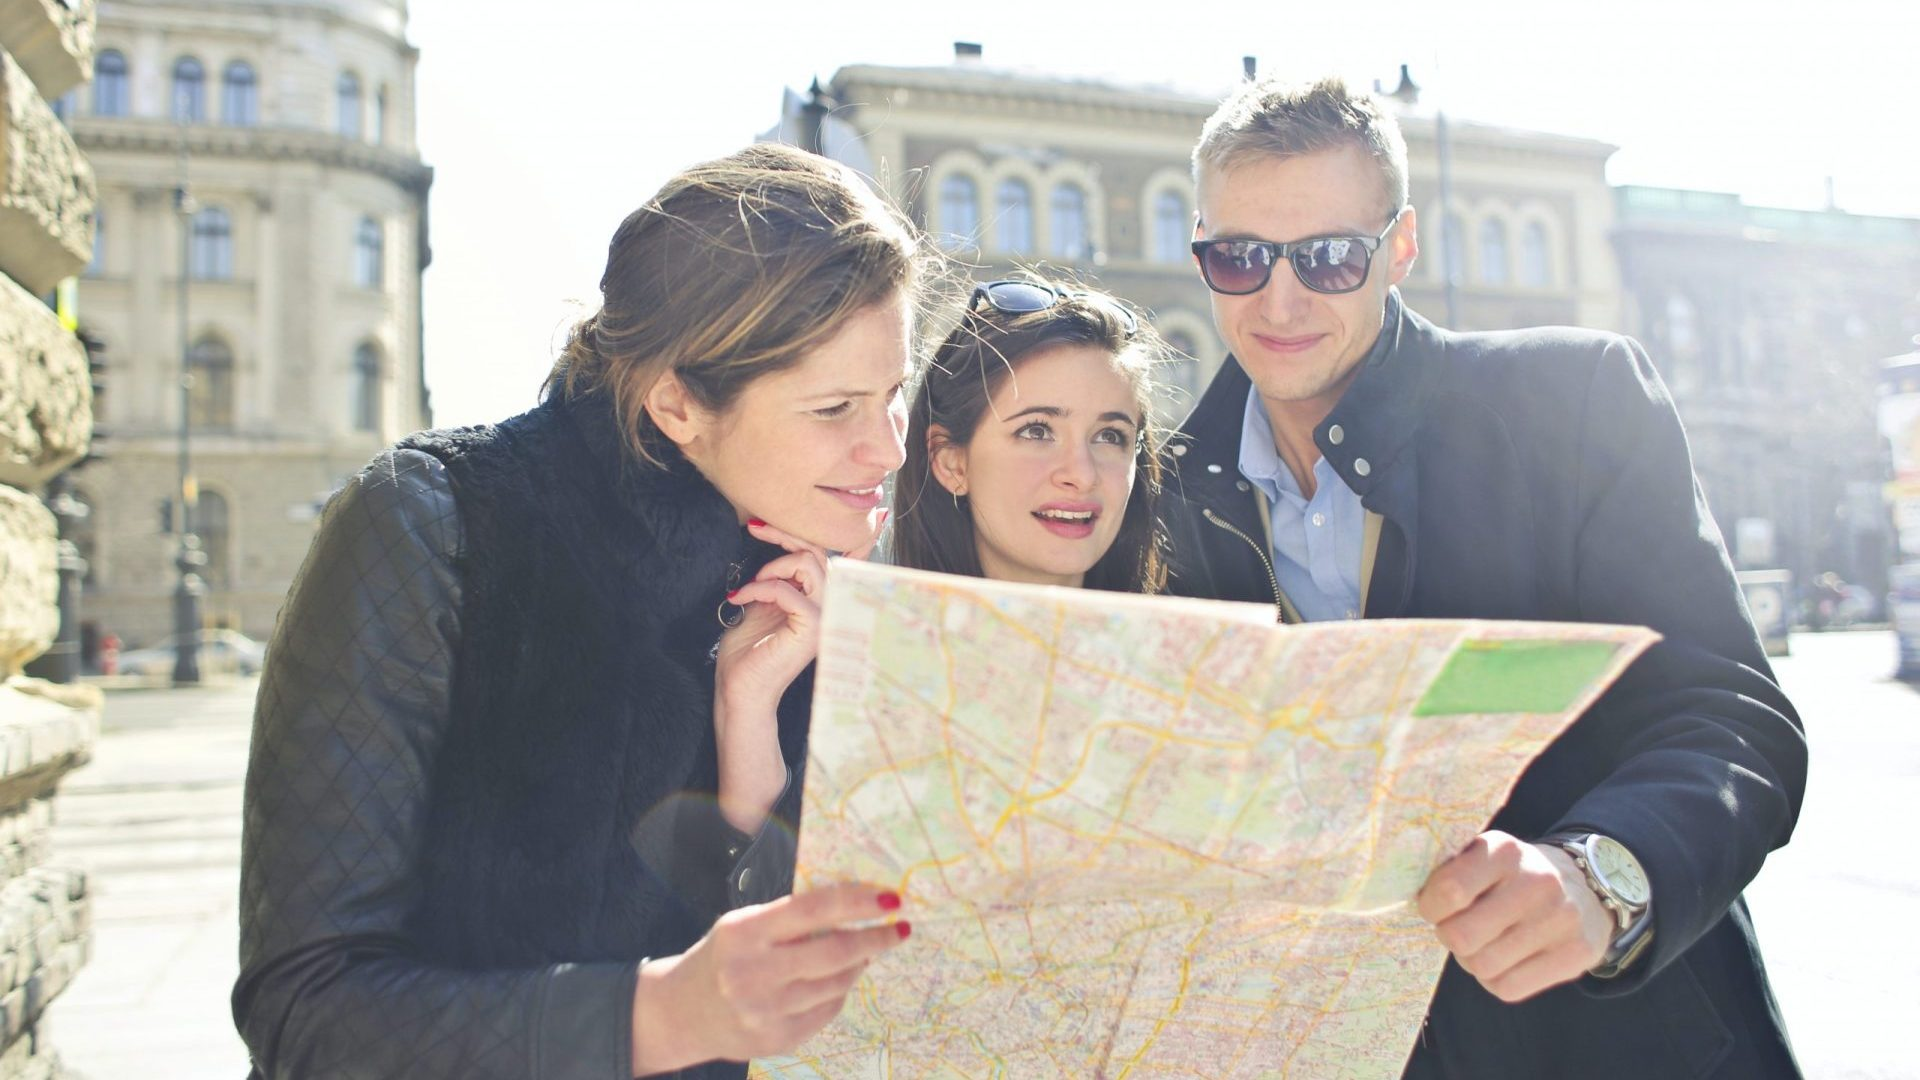 turisticna agecija Iter - delo turisticnega vodnika